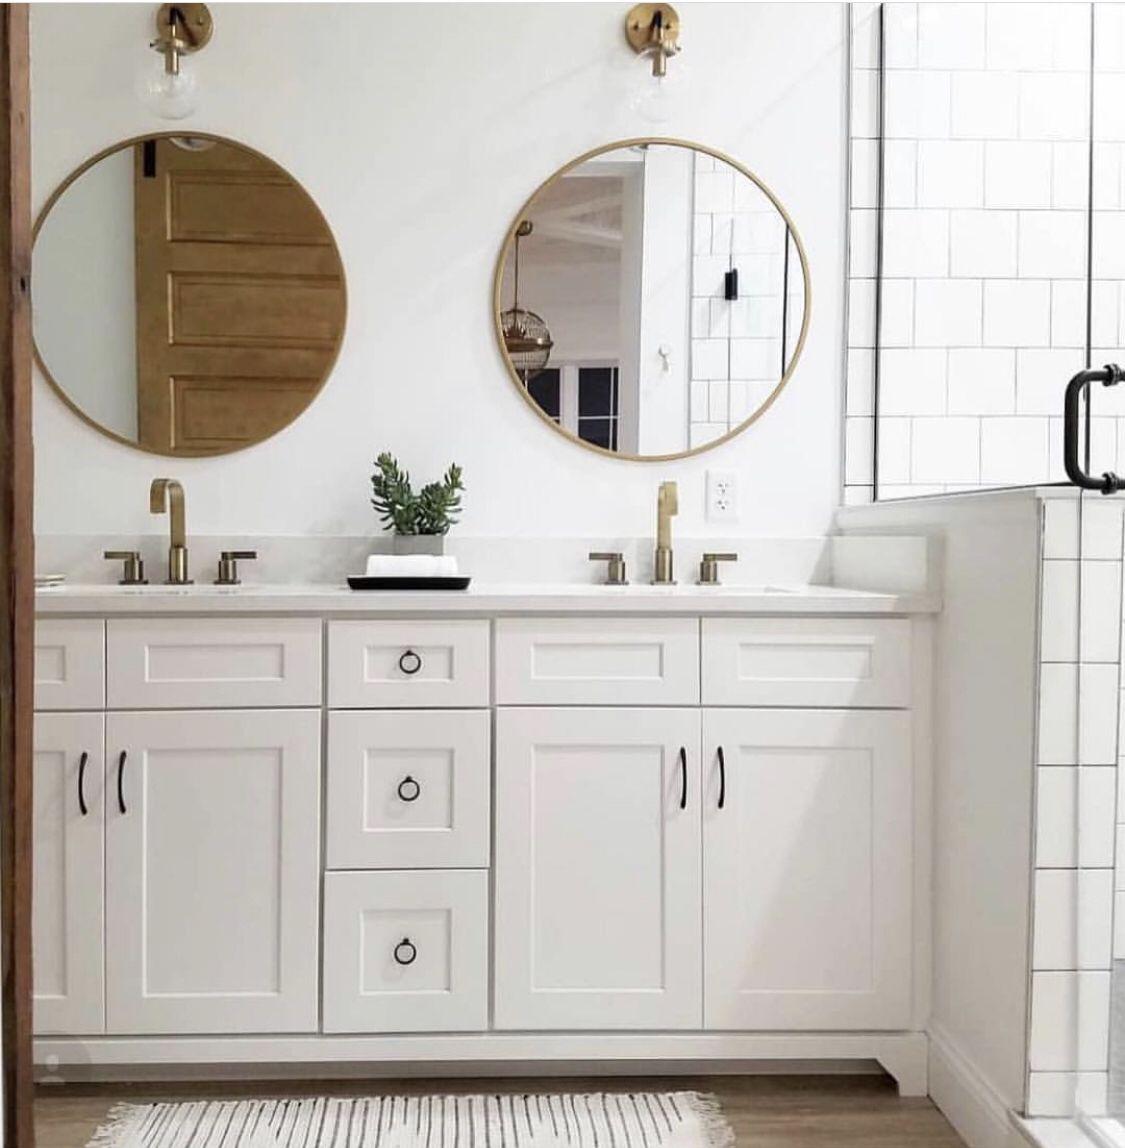 Senya Gold Leaf Round Mirror Round Mirror Bathroom Bathroom Interior Bathroom Design